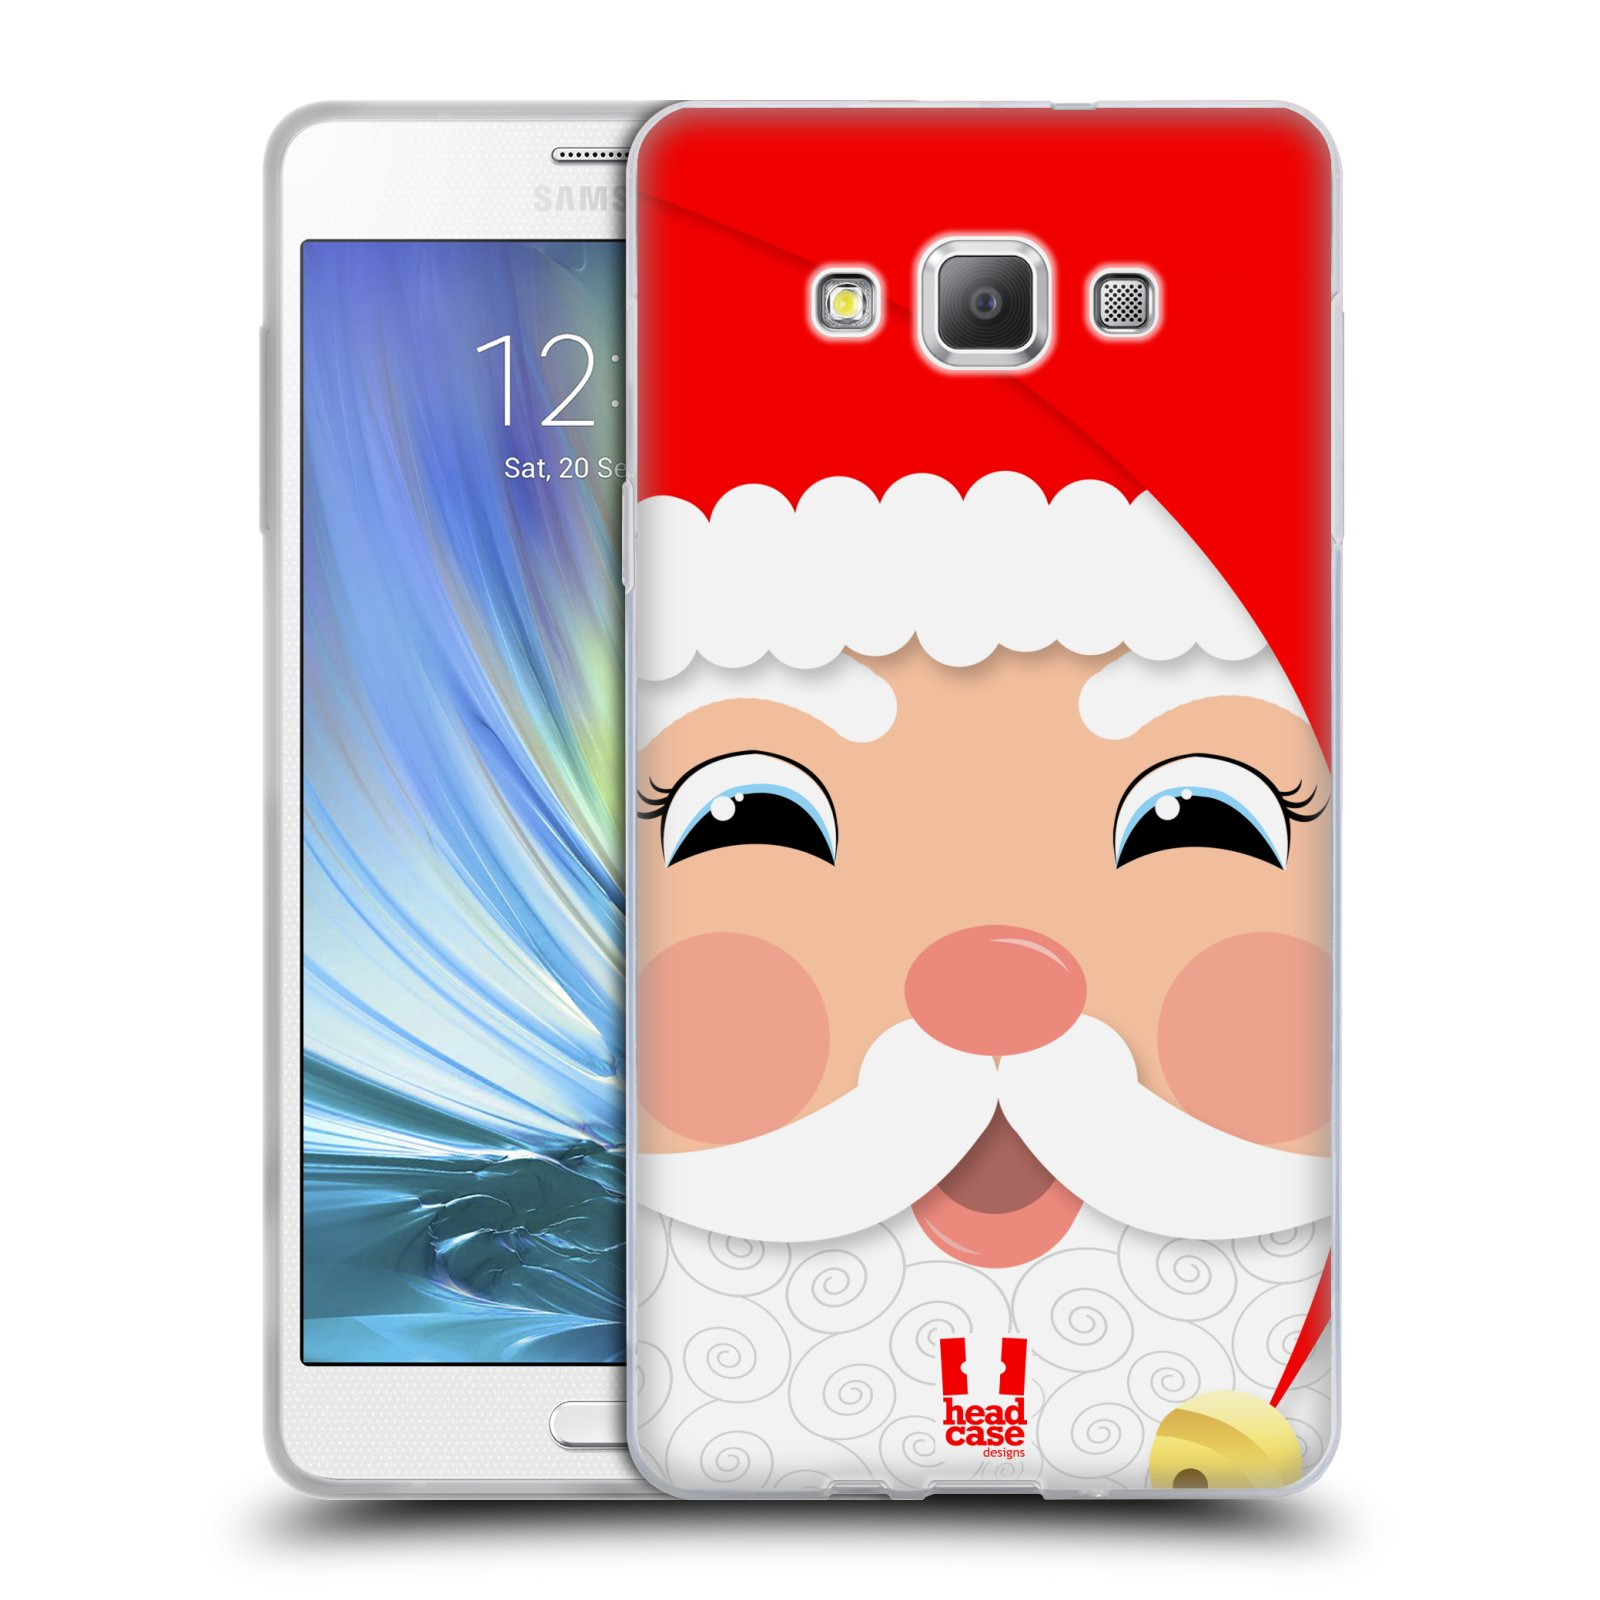 HEAD CASE silikonový obal na mobil Samsung Galaxy A7 vzor Vánoční tváře kreslené SANTA CLAUS